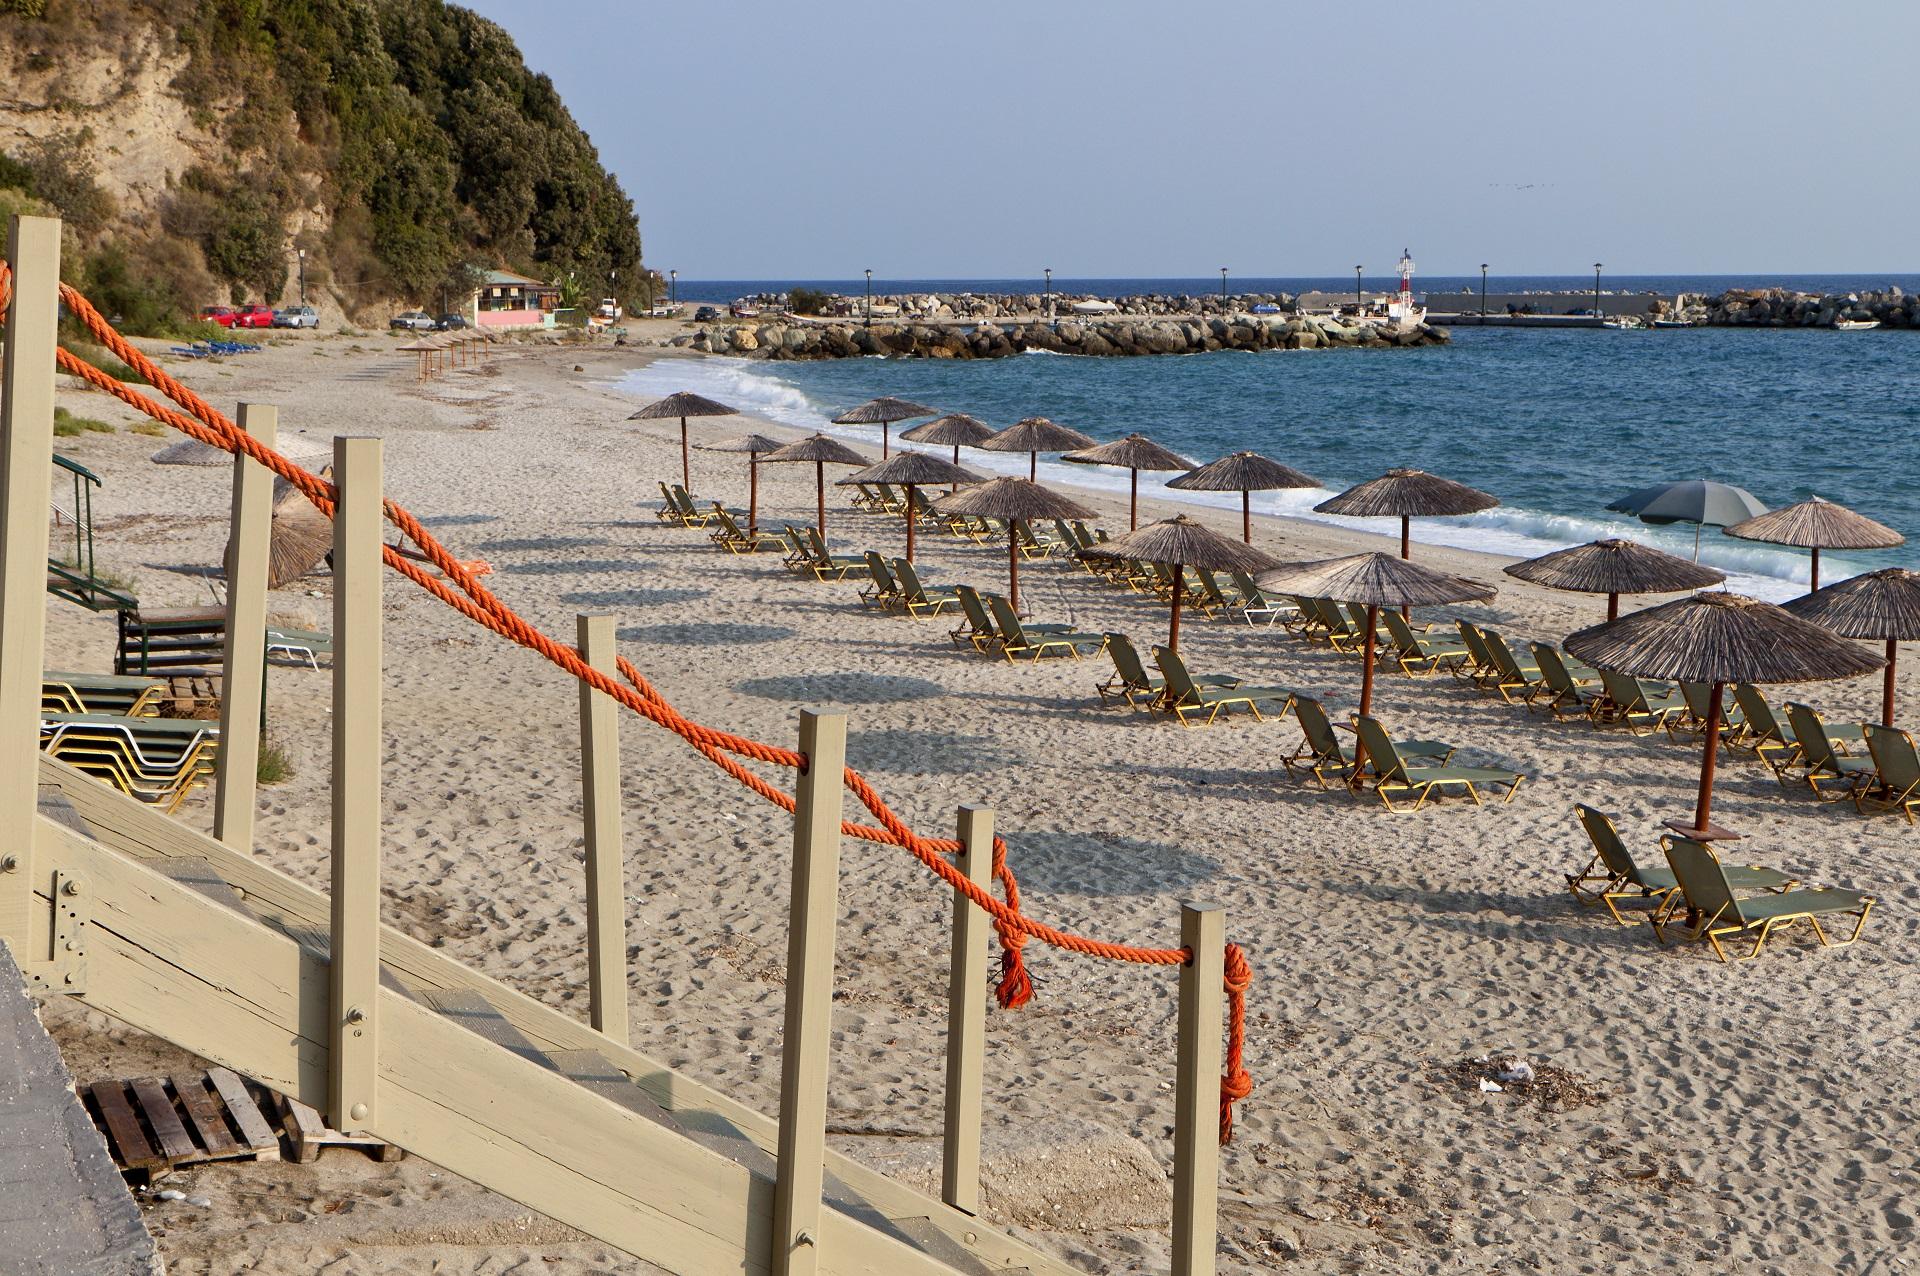 Agios Ioannis village and beach at Pelion